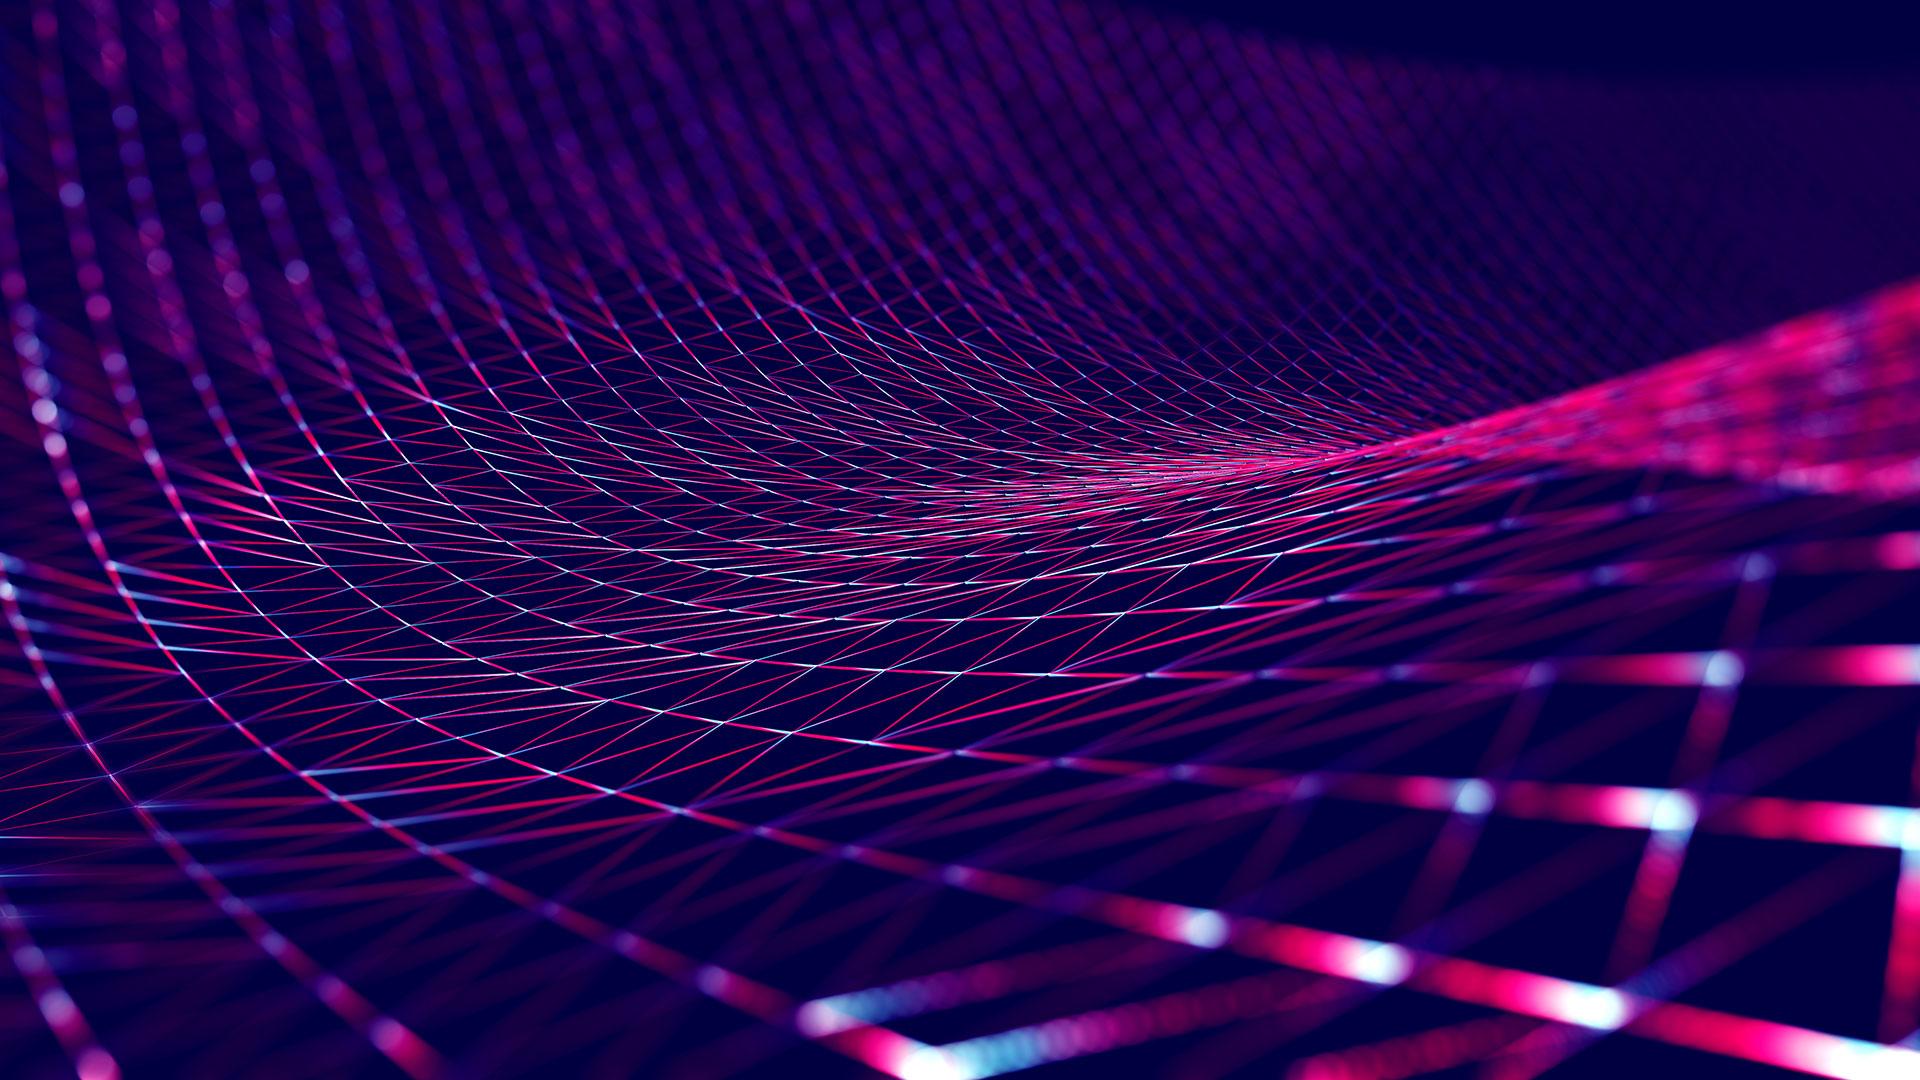 Brightly colored digital mesh design